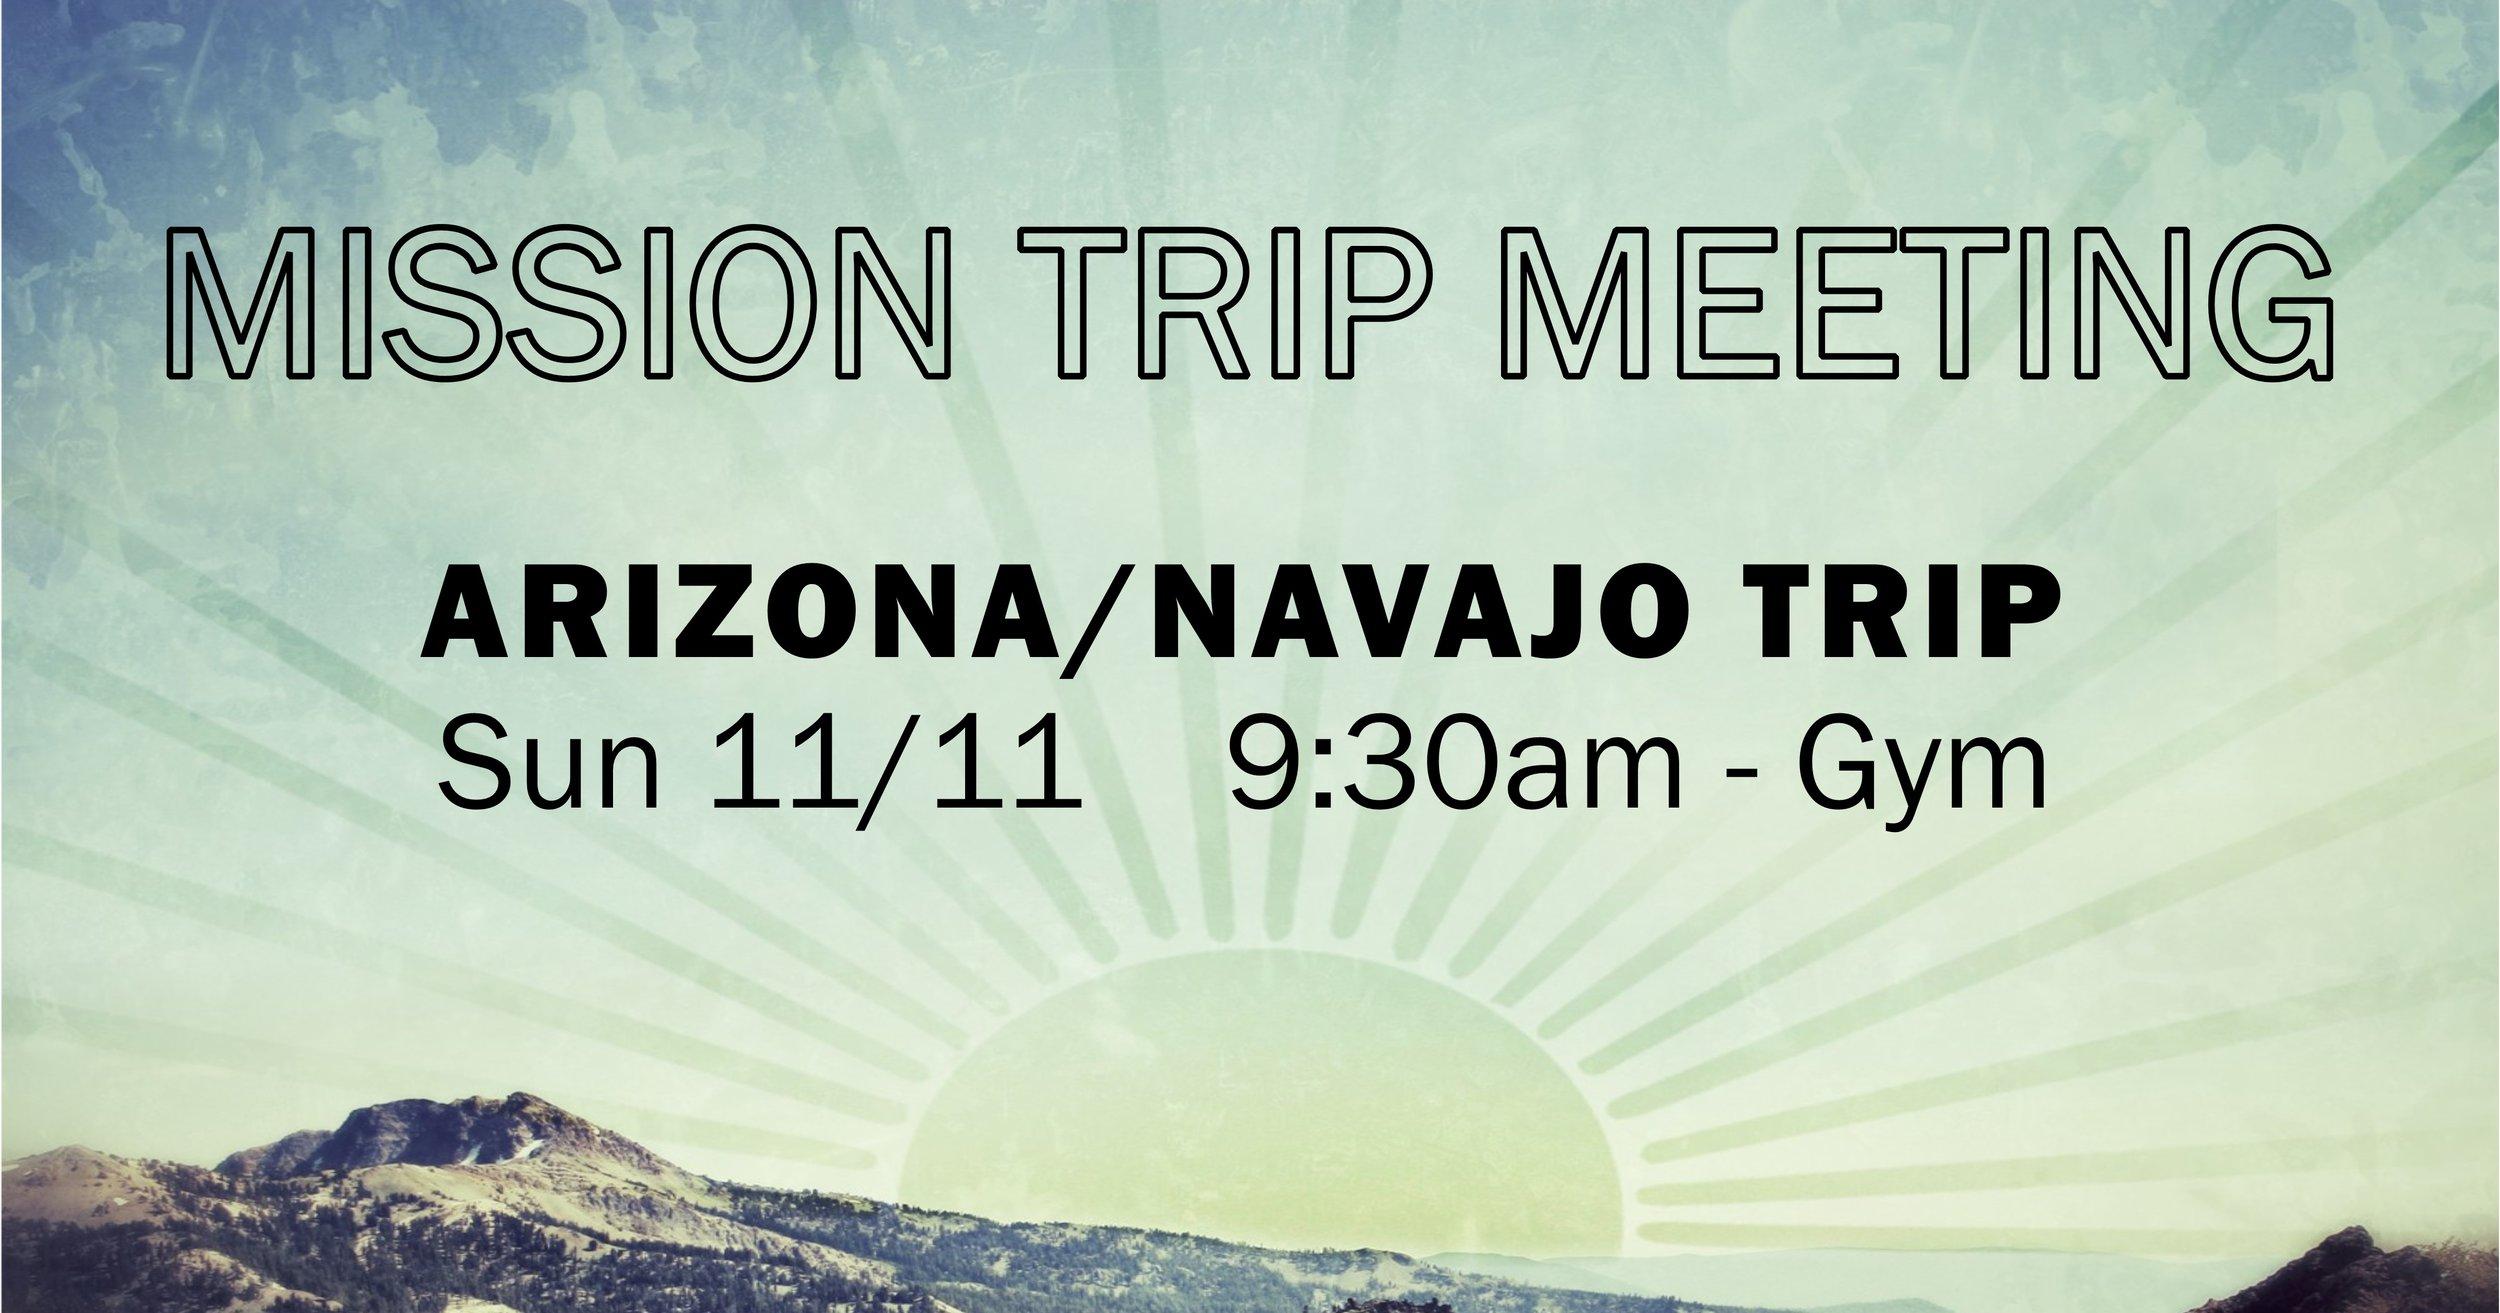 Mission Trip Mtg navajo  facebook link 100718.jpg